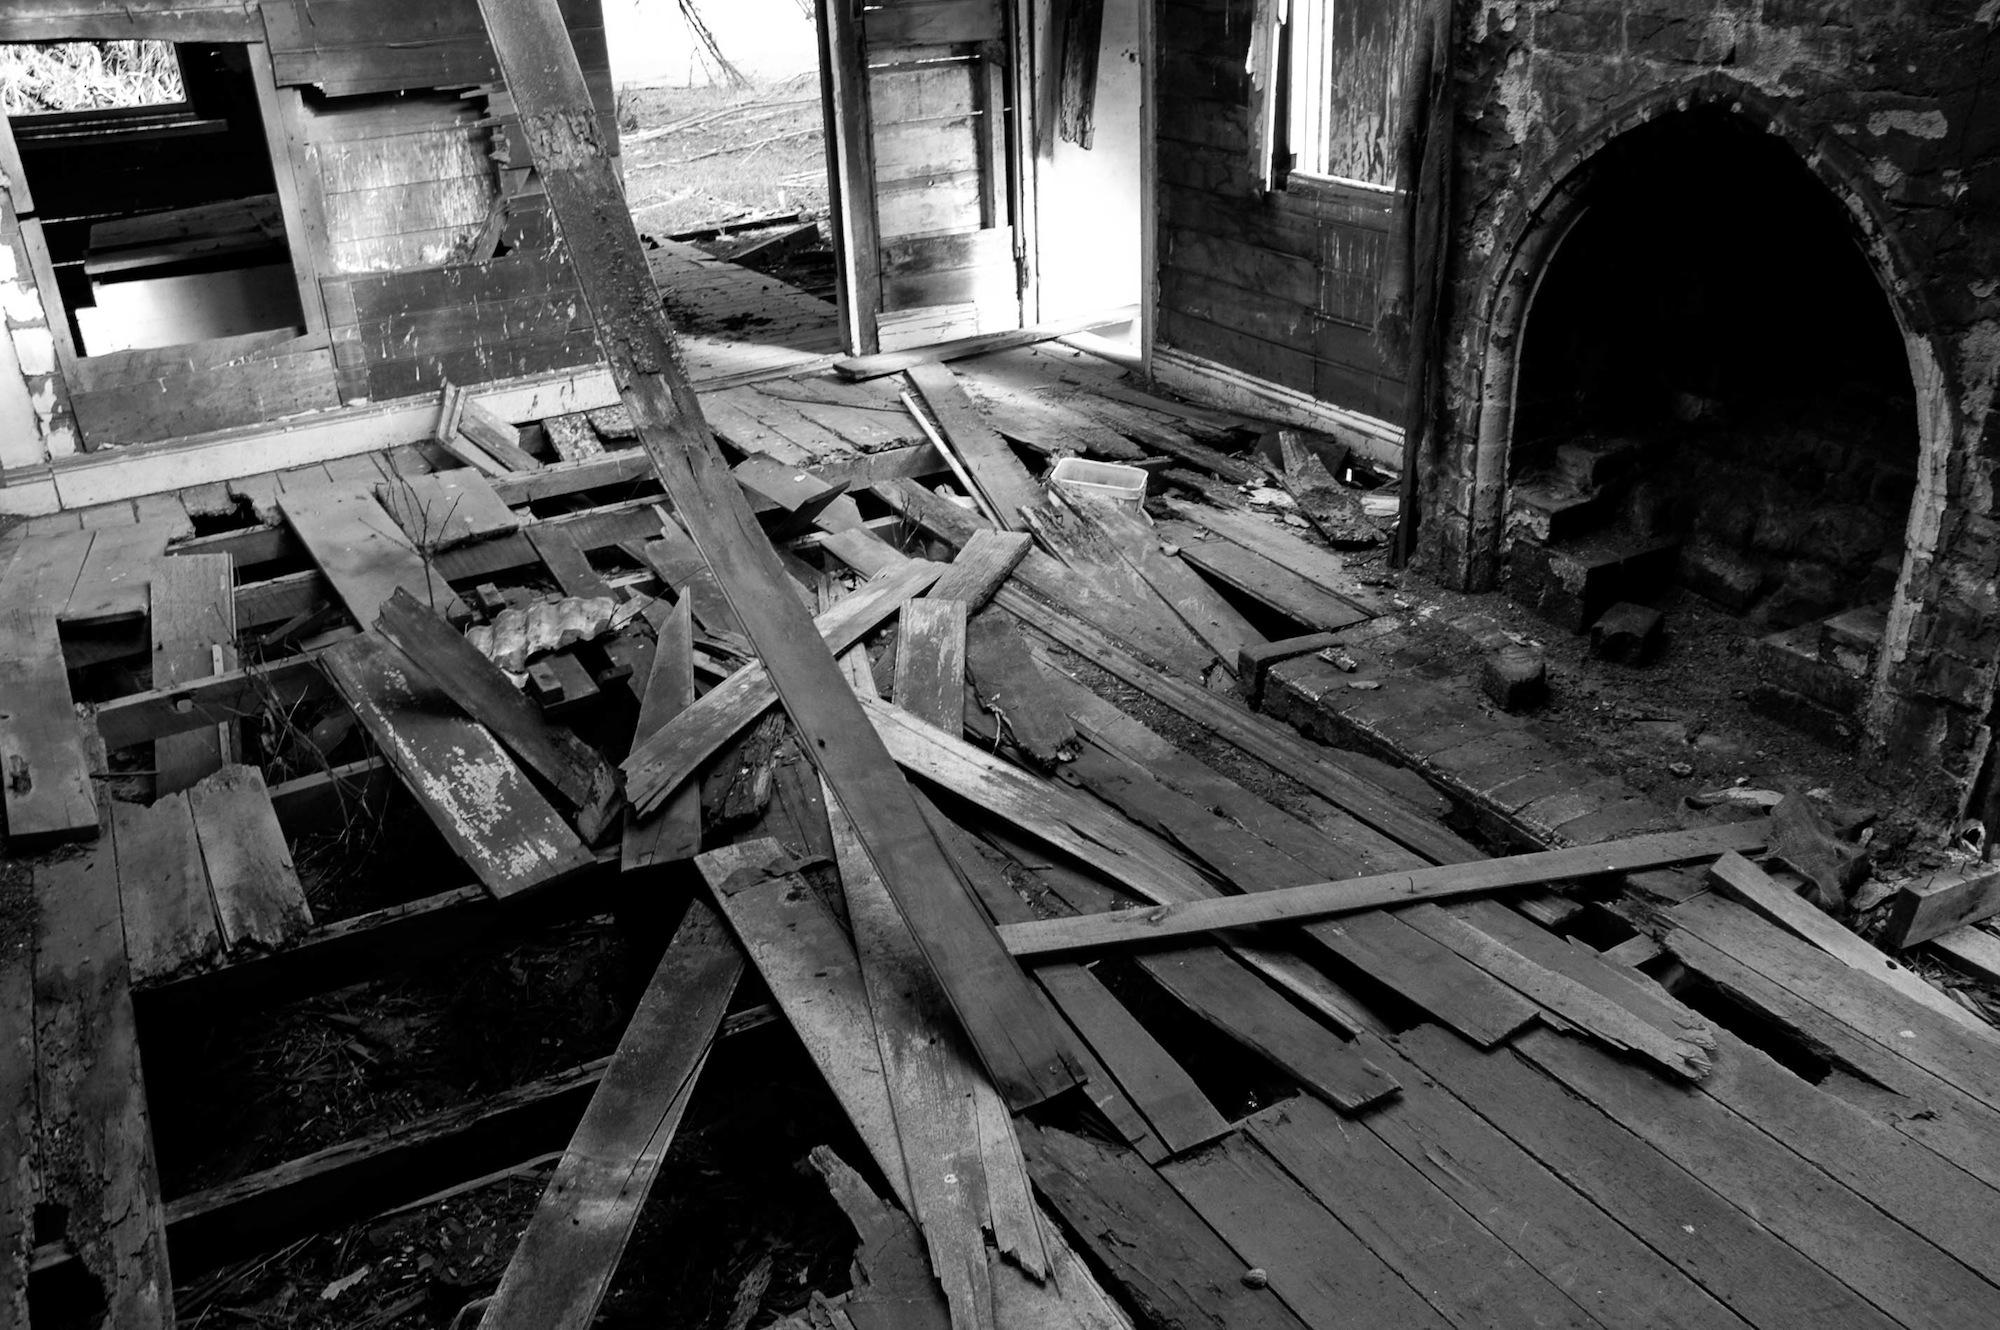 abandoned_house_new zealand_ben_howe_7.jpg